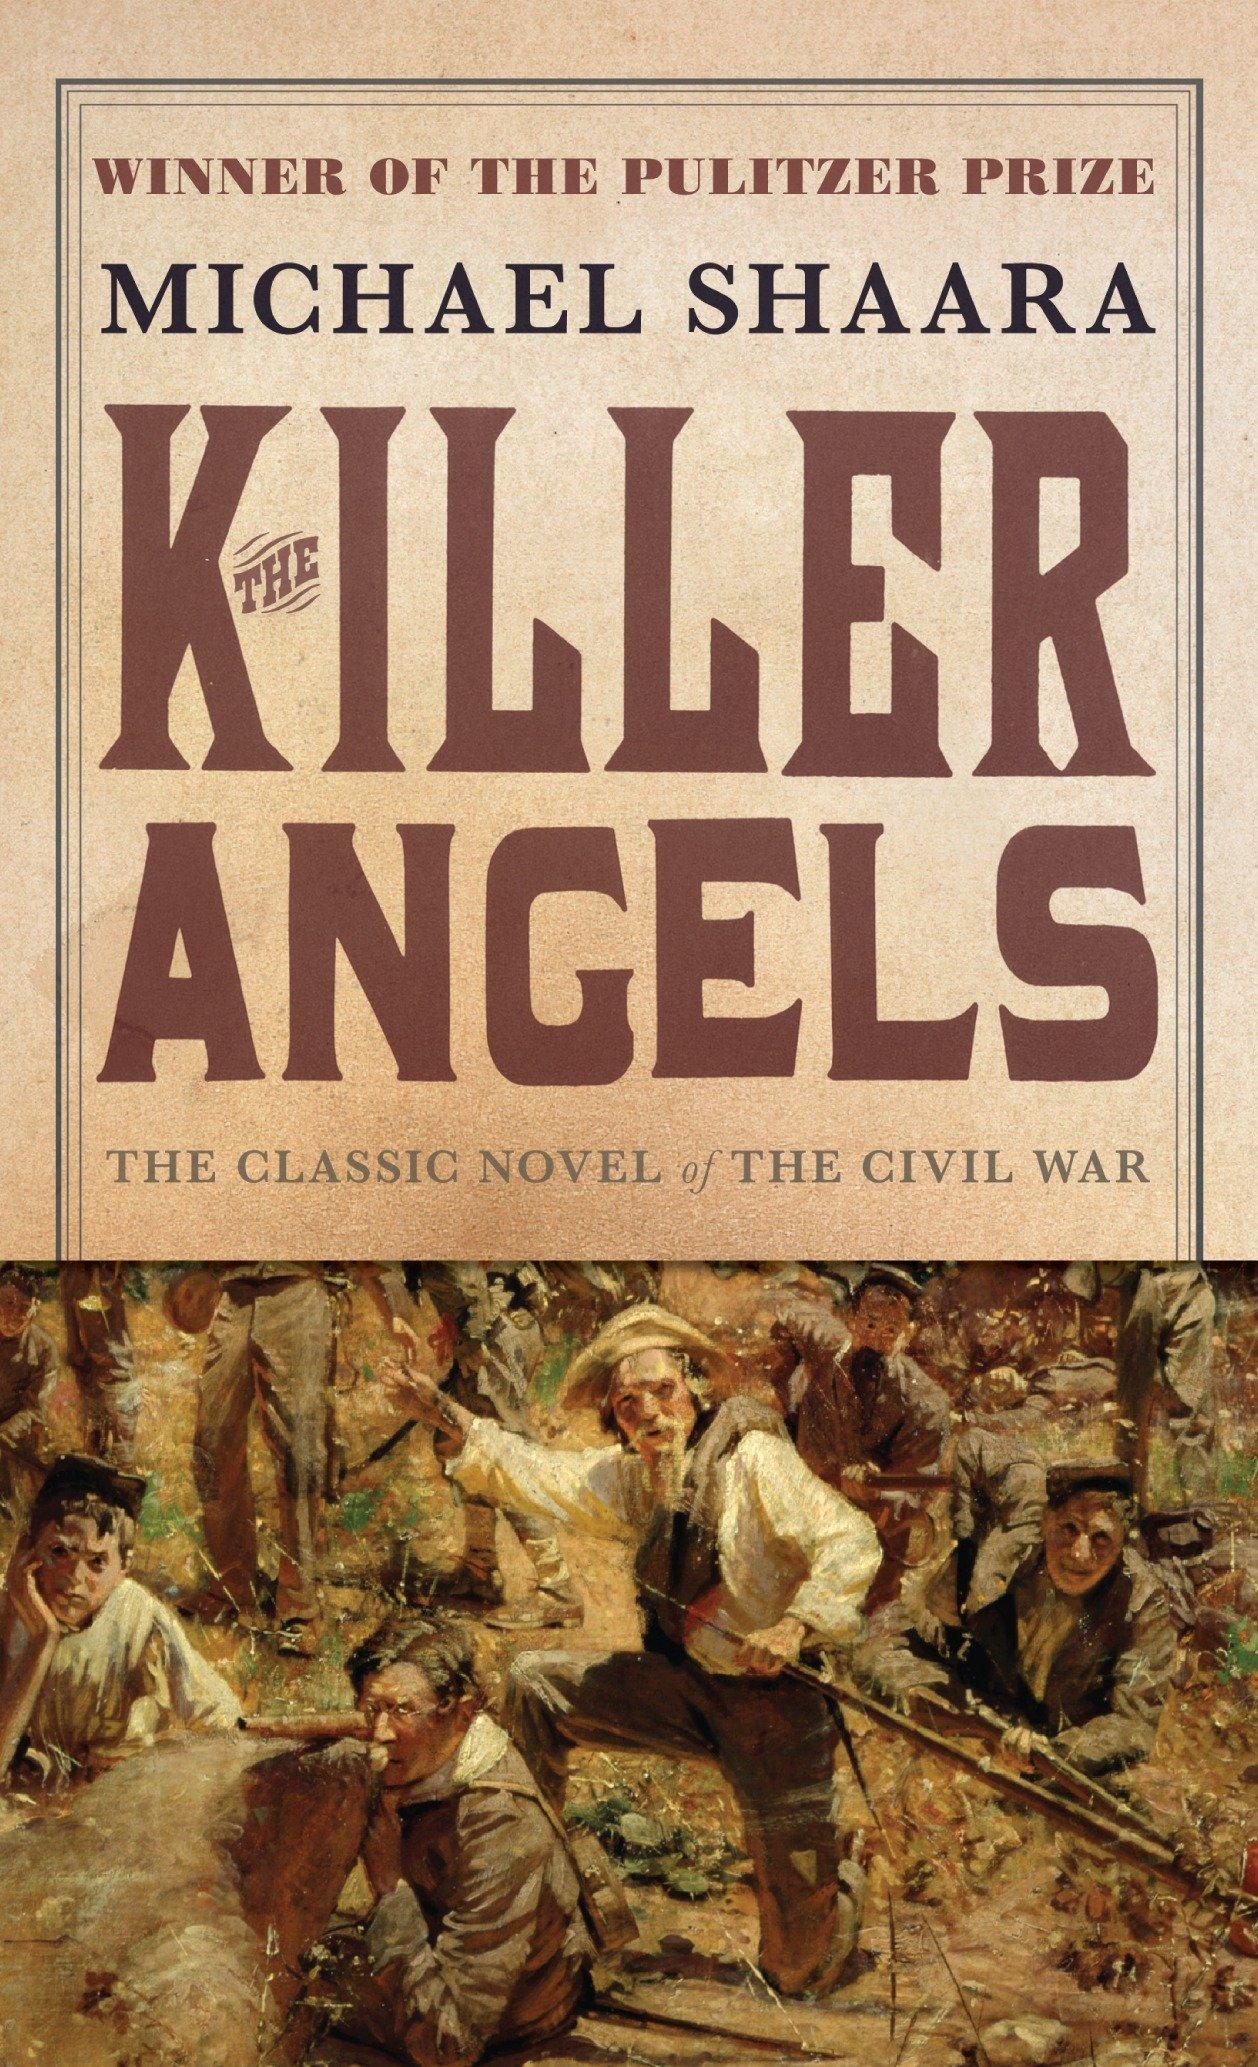 Civil war book prizes for non-fiction